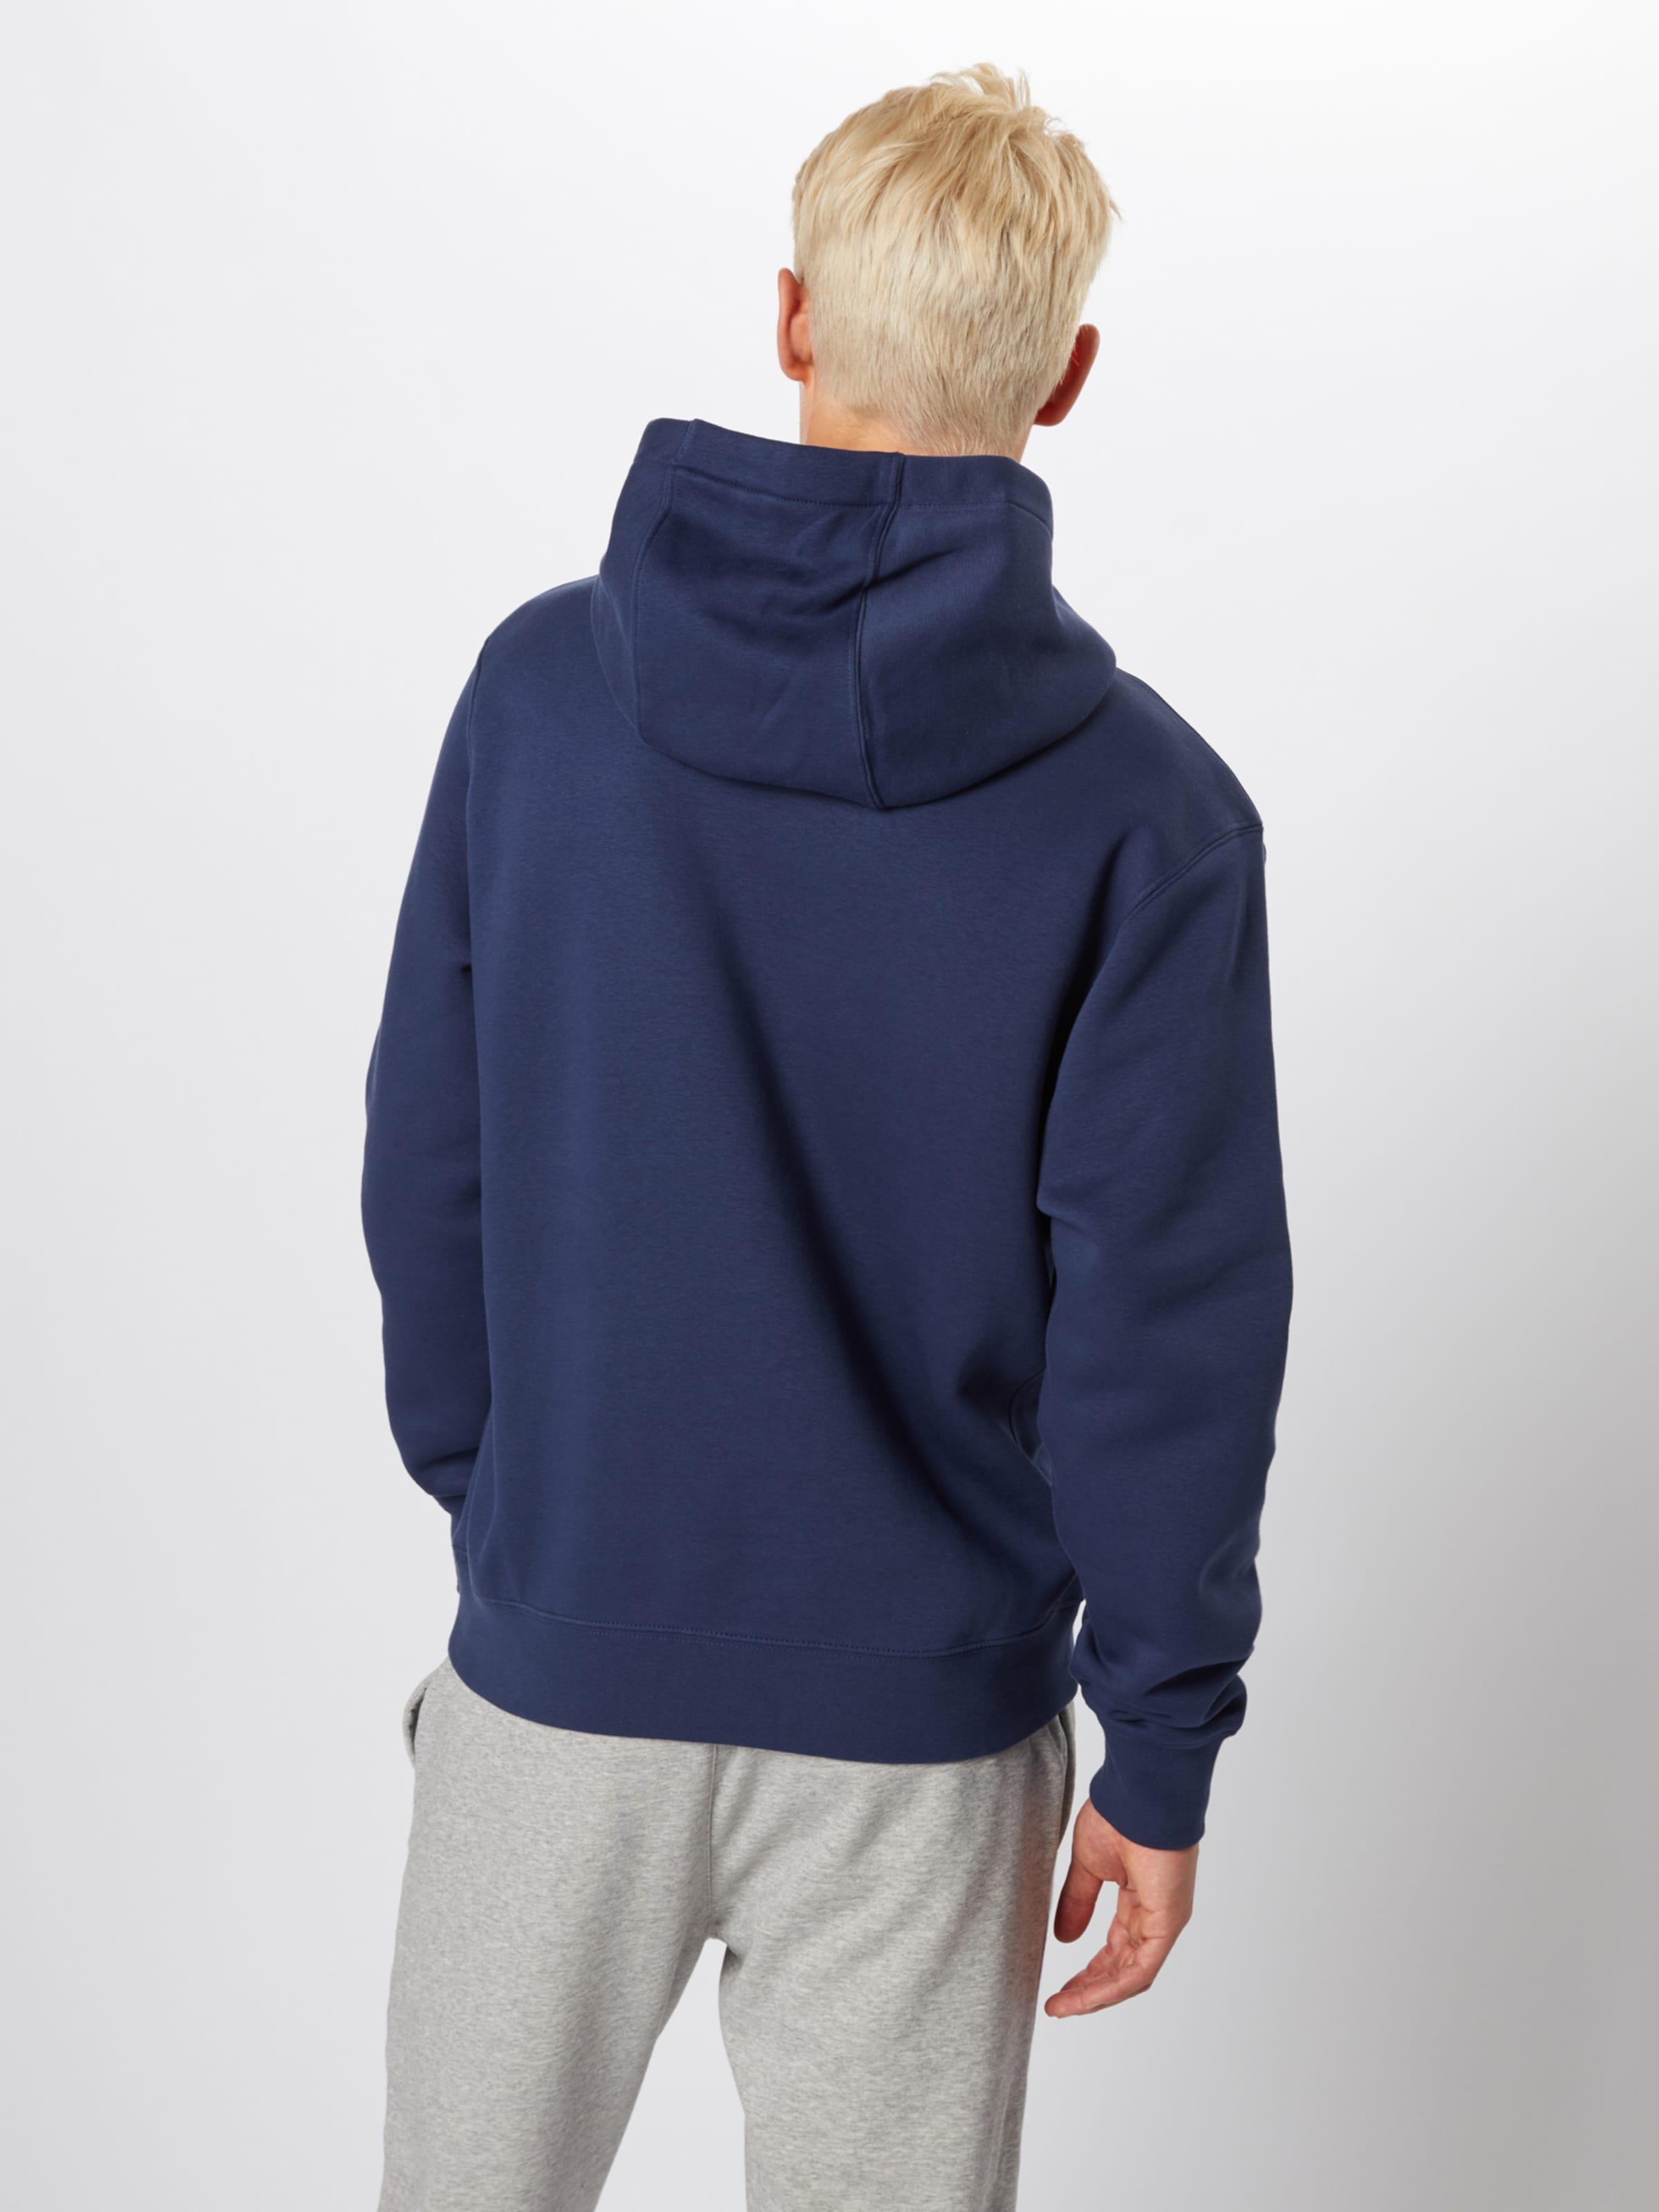 Dunkelblau Sweatshirt 'club' Sportswear Nike In oCBxed